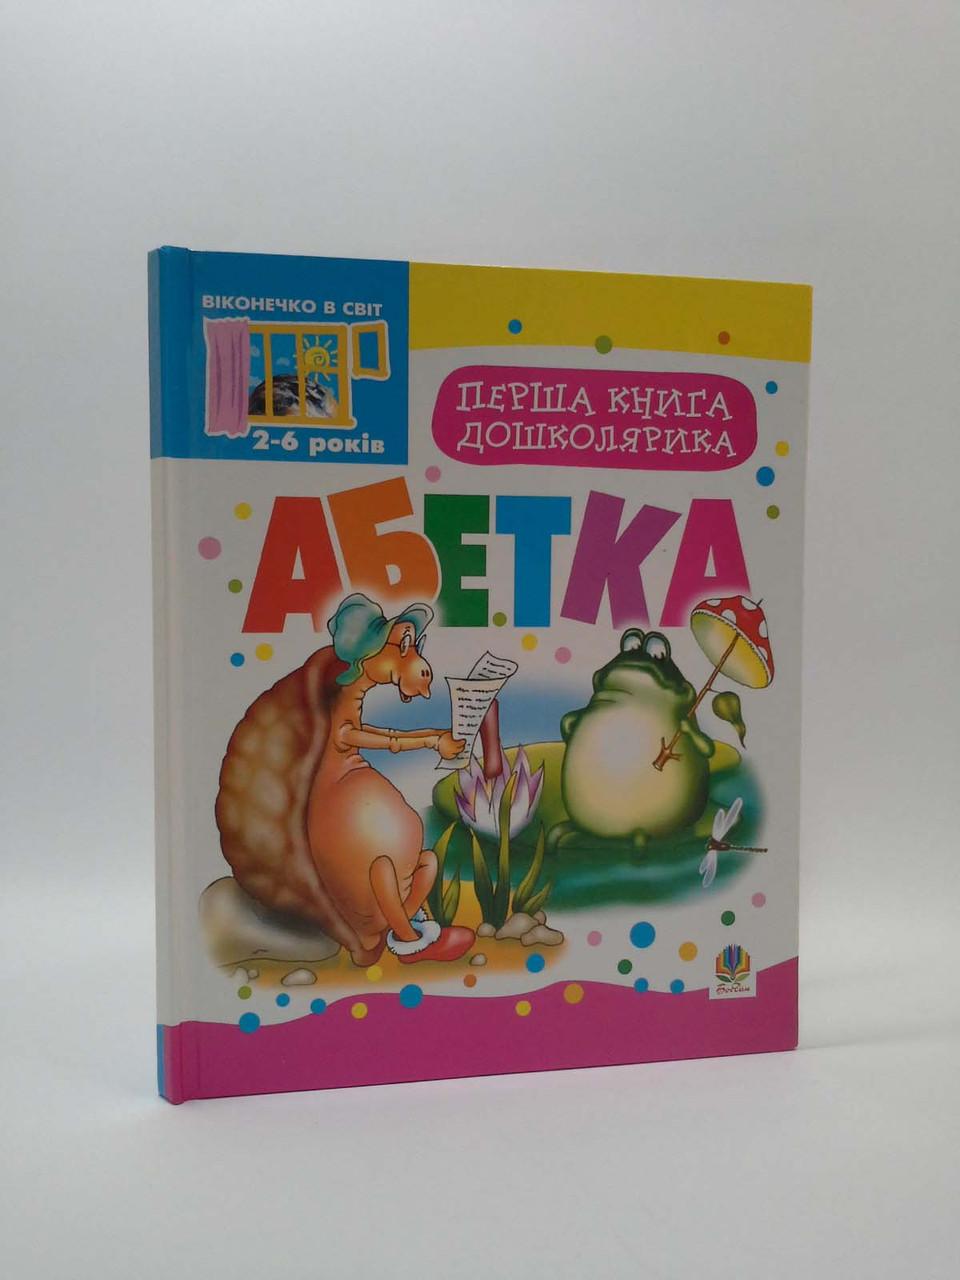 Богдан Перша книга дошколярика Абетка Будна